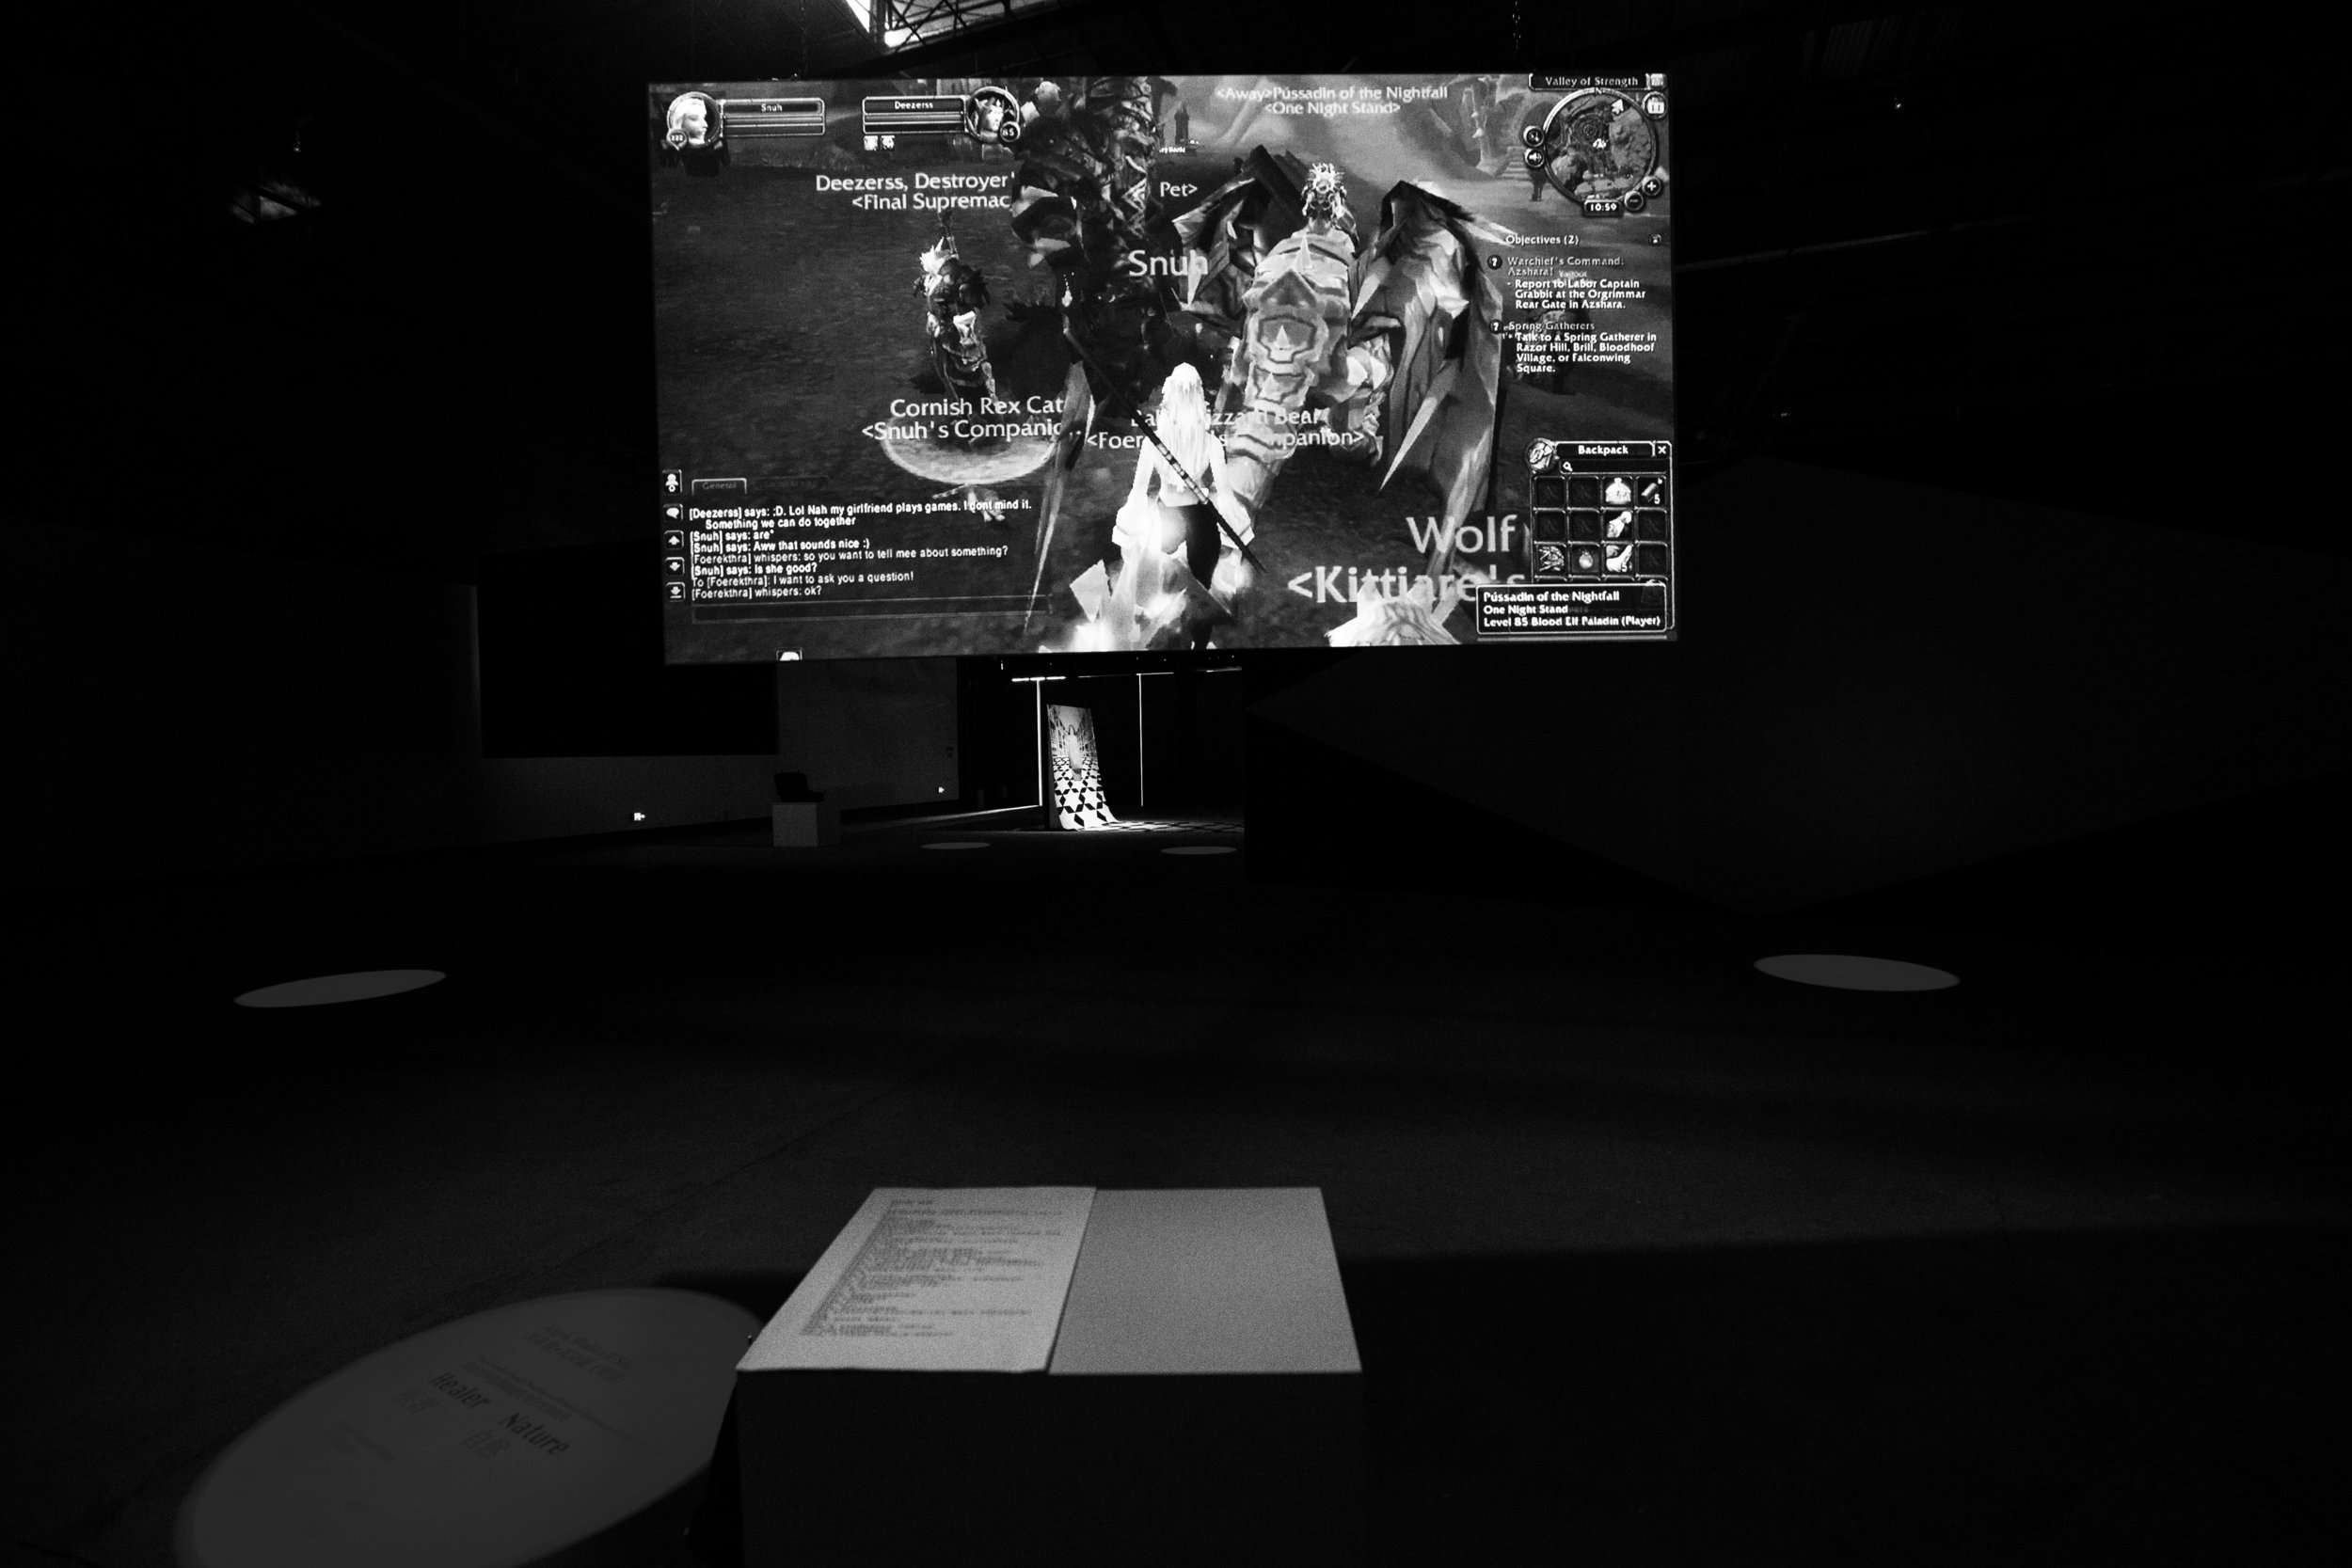 "- 安吉拉·瓦施蔻在 2012 年初创立了""魔兽世界性别敏感性与行为意识处"" ,介入网络 《魔兽世界》——这个有史以来最受欢迎的多人角色扮演游戏。瓦施蔻并没有按照游戏的结构和逻辑——屠龙、获取更强的装备、加入更多更强大的团体......透过她建立的线上机构,她在玩家之间发起讨论,探讨他们是如何看待女性,以及对""女权 主义""一词的看法。瓦施蔻创造了一个基于网络玩家的环境,对女性友好的强制性女 权主义空间。魔兽世界的玩家社群无论在地域上、政治上、经济上、社会上和种族上都非常多元(比瓦施蔻生活中公共空间更多元)。因此,游戏空间内产生的讨论更能反映现在美国人对""女性""角色的辩证看法。In early 2012 Angela Washko founded ""The Council on Gender Sensitivity and Behavioral Awareness in World of Warcraft"" as an intervention within World of Warcraft, the most popular massively multiplayer role-playing game of all time. Instead of continuing to follow the quest structure of the game--killing dragons, getting better equipment, joining more competitive guilds...while performing as ""The Council on Gender Sensitivity and Behavioral Awareness in World of Warcraft"", Washko facilitates discussions with players inside the game about the ways in which the communities therein addresses women and how players respond to the term ""FEMINISM"". Washko is interested in the impulse of the player-base to create an oppressive, misogynistic space for women within a physical environment that is otherwise accessible and inviting. Furthermore, WoW is a geographically, politically, economically, socially, and racially diverse community (a much more varied community to engage with than she has in physical public space). Consequently these discussions within the game space create a much larger picture of the American opinion of what women should and should not be today.医者(魔兽世界性别敏感性与行为意识处)Healer (The Council on Gender Sensitivity and Behavioral Awareness in World of Warcraft)单屏幕录像Single Channel Video 4'16"